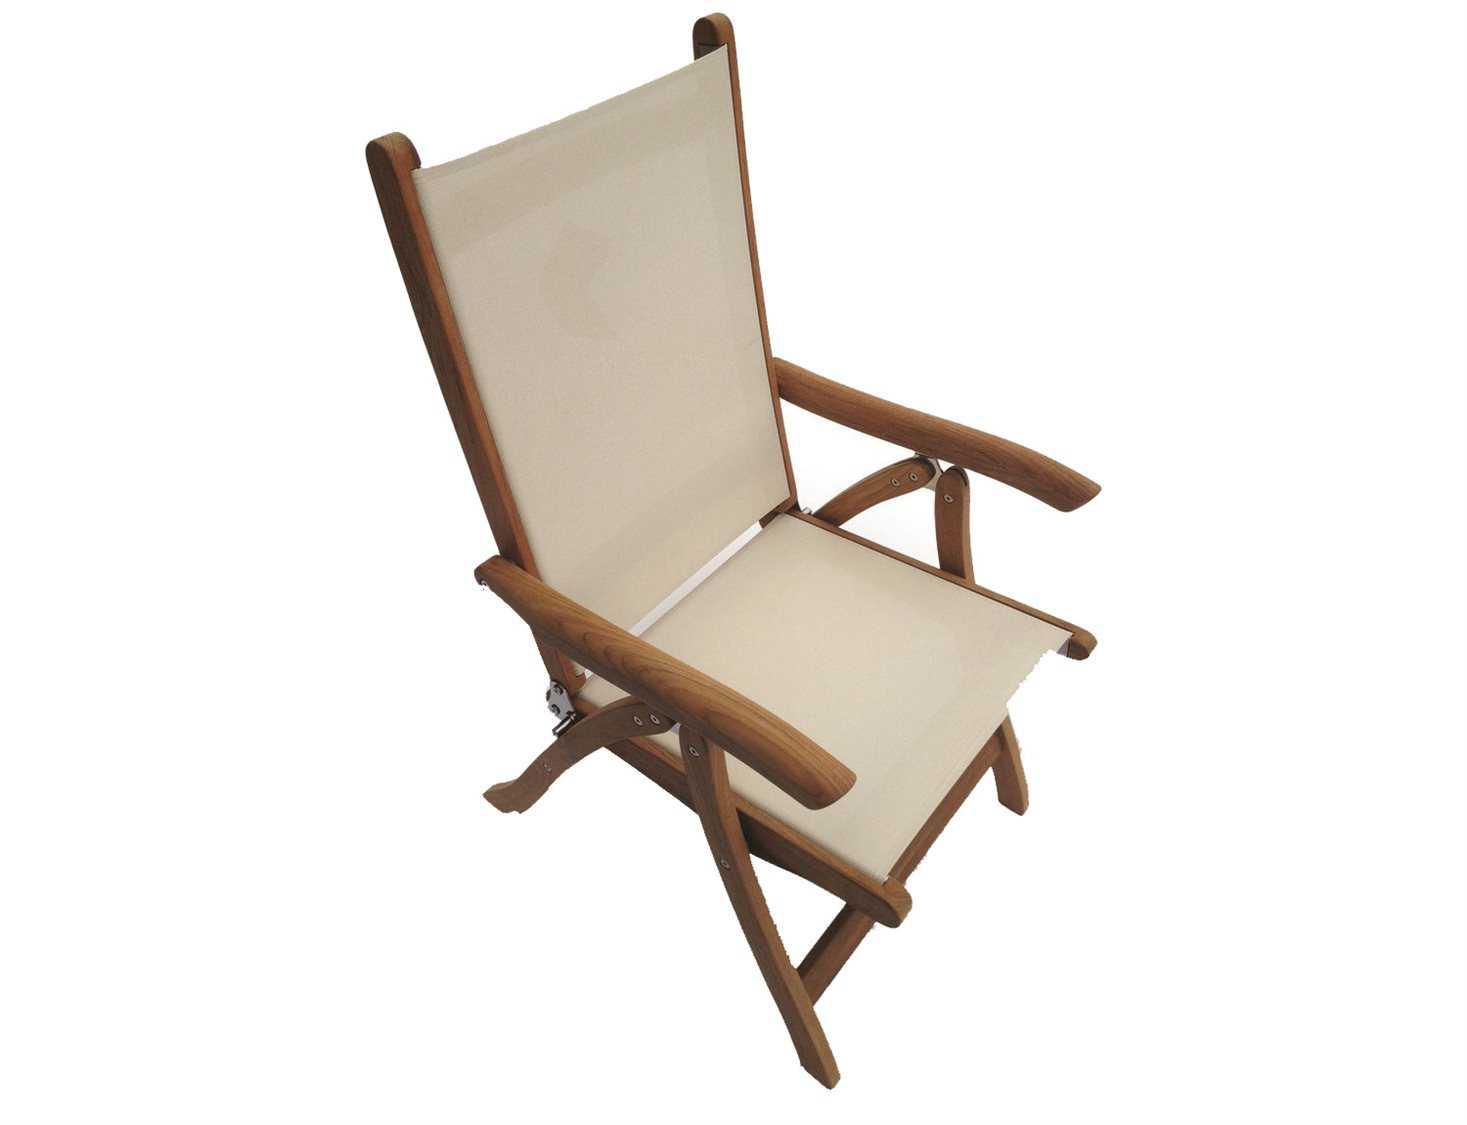 Peachy Royal Teak Collection Florida White Sling Adjustable Folding Dining Arm Chair Evergreenethics Interior Chair Design Evergreenethicsorg